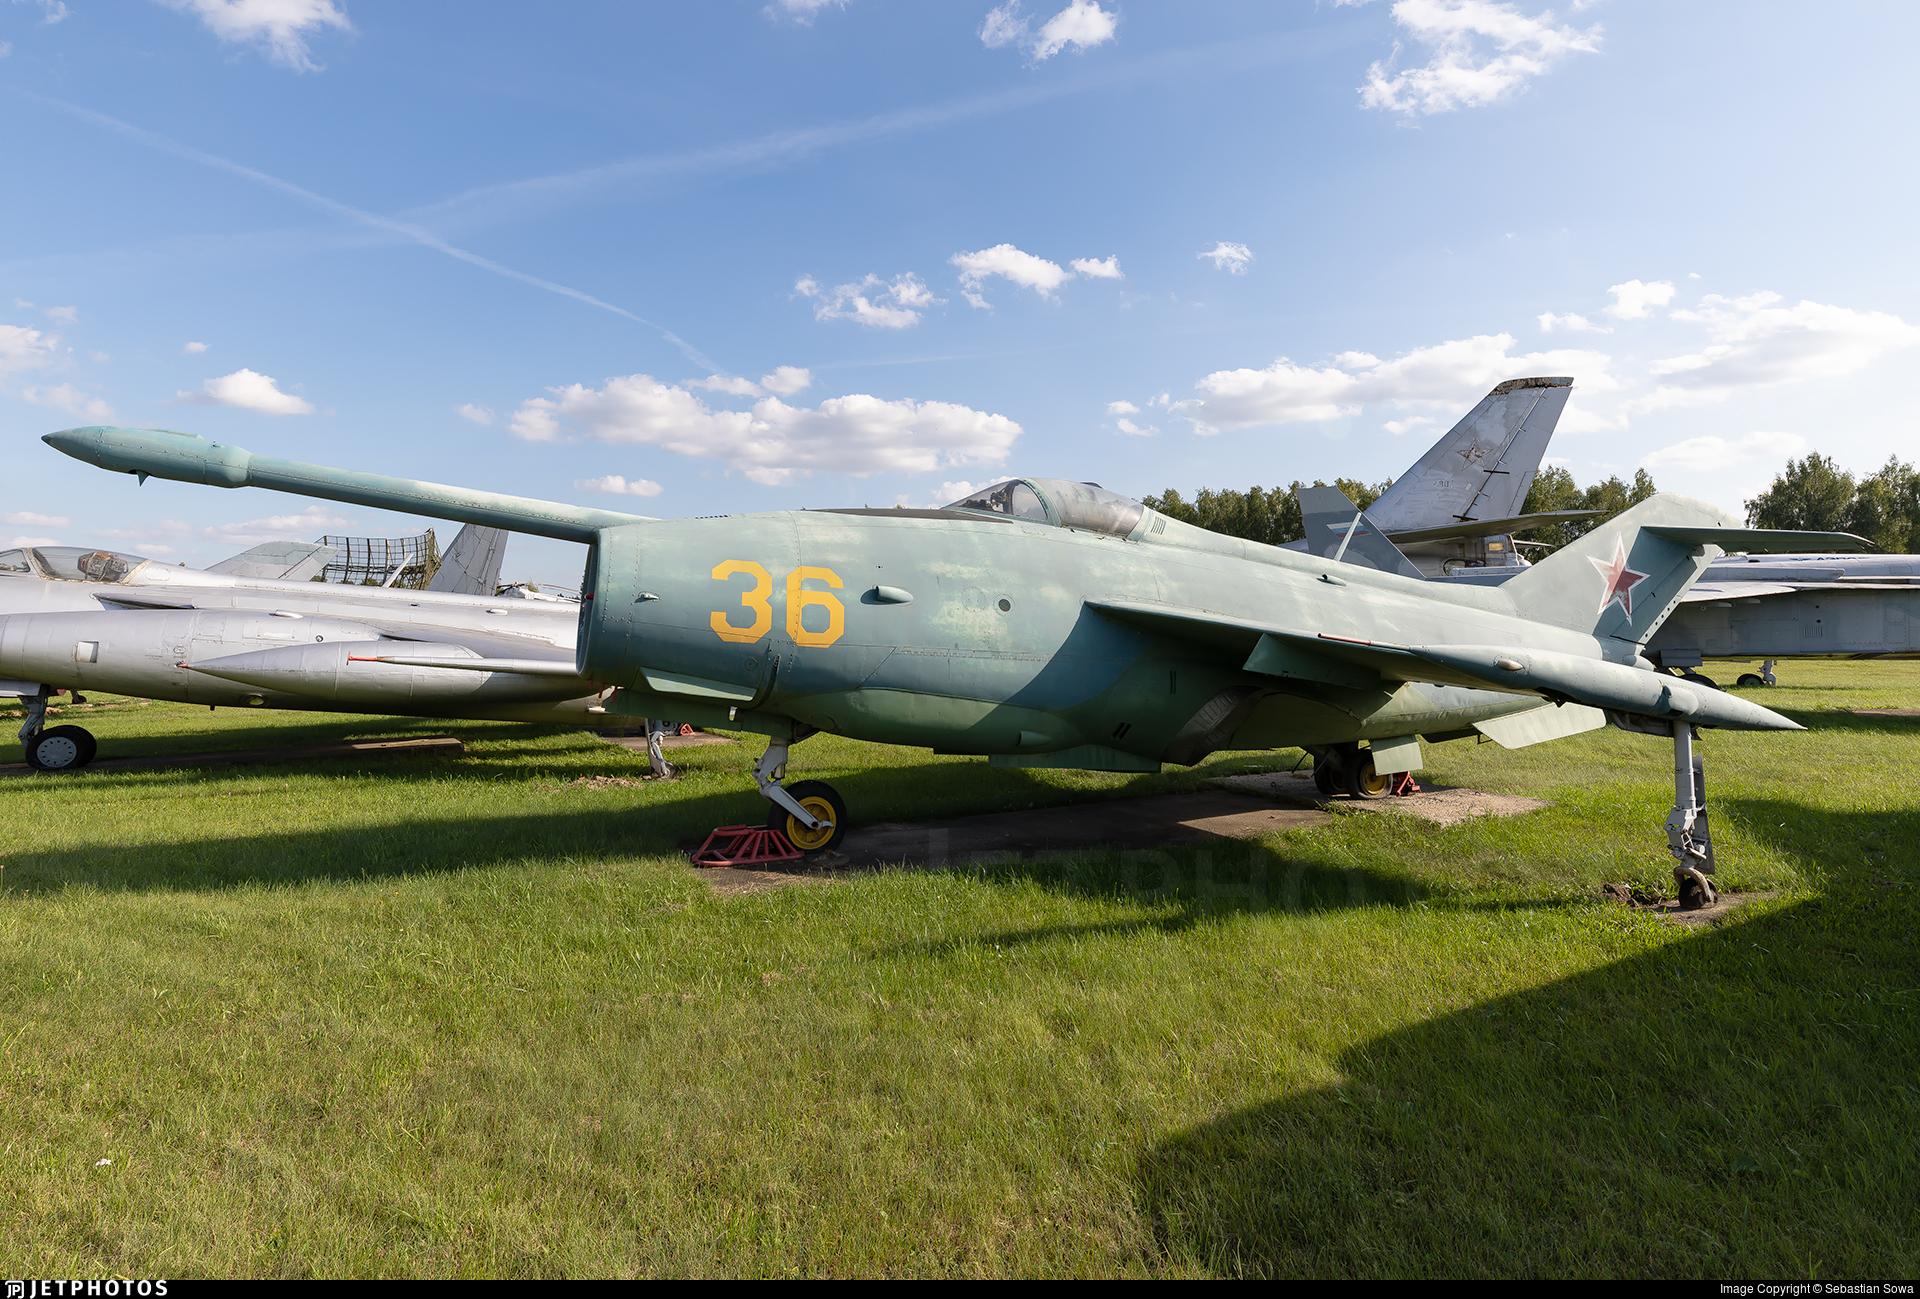 36 - Yakovlev Yak-36 Freehand - Yakovlev Design Bureau